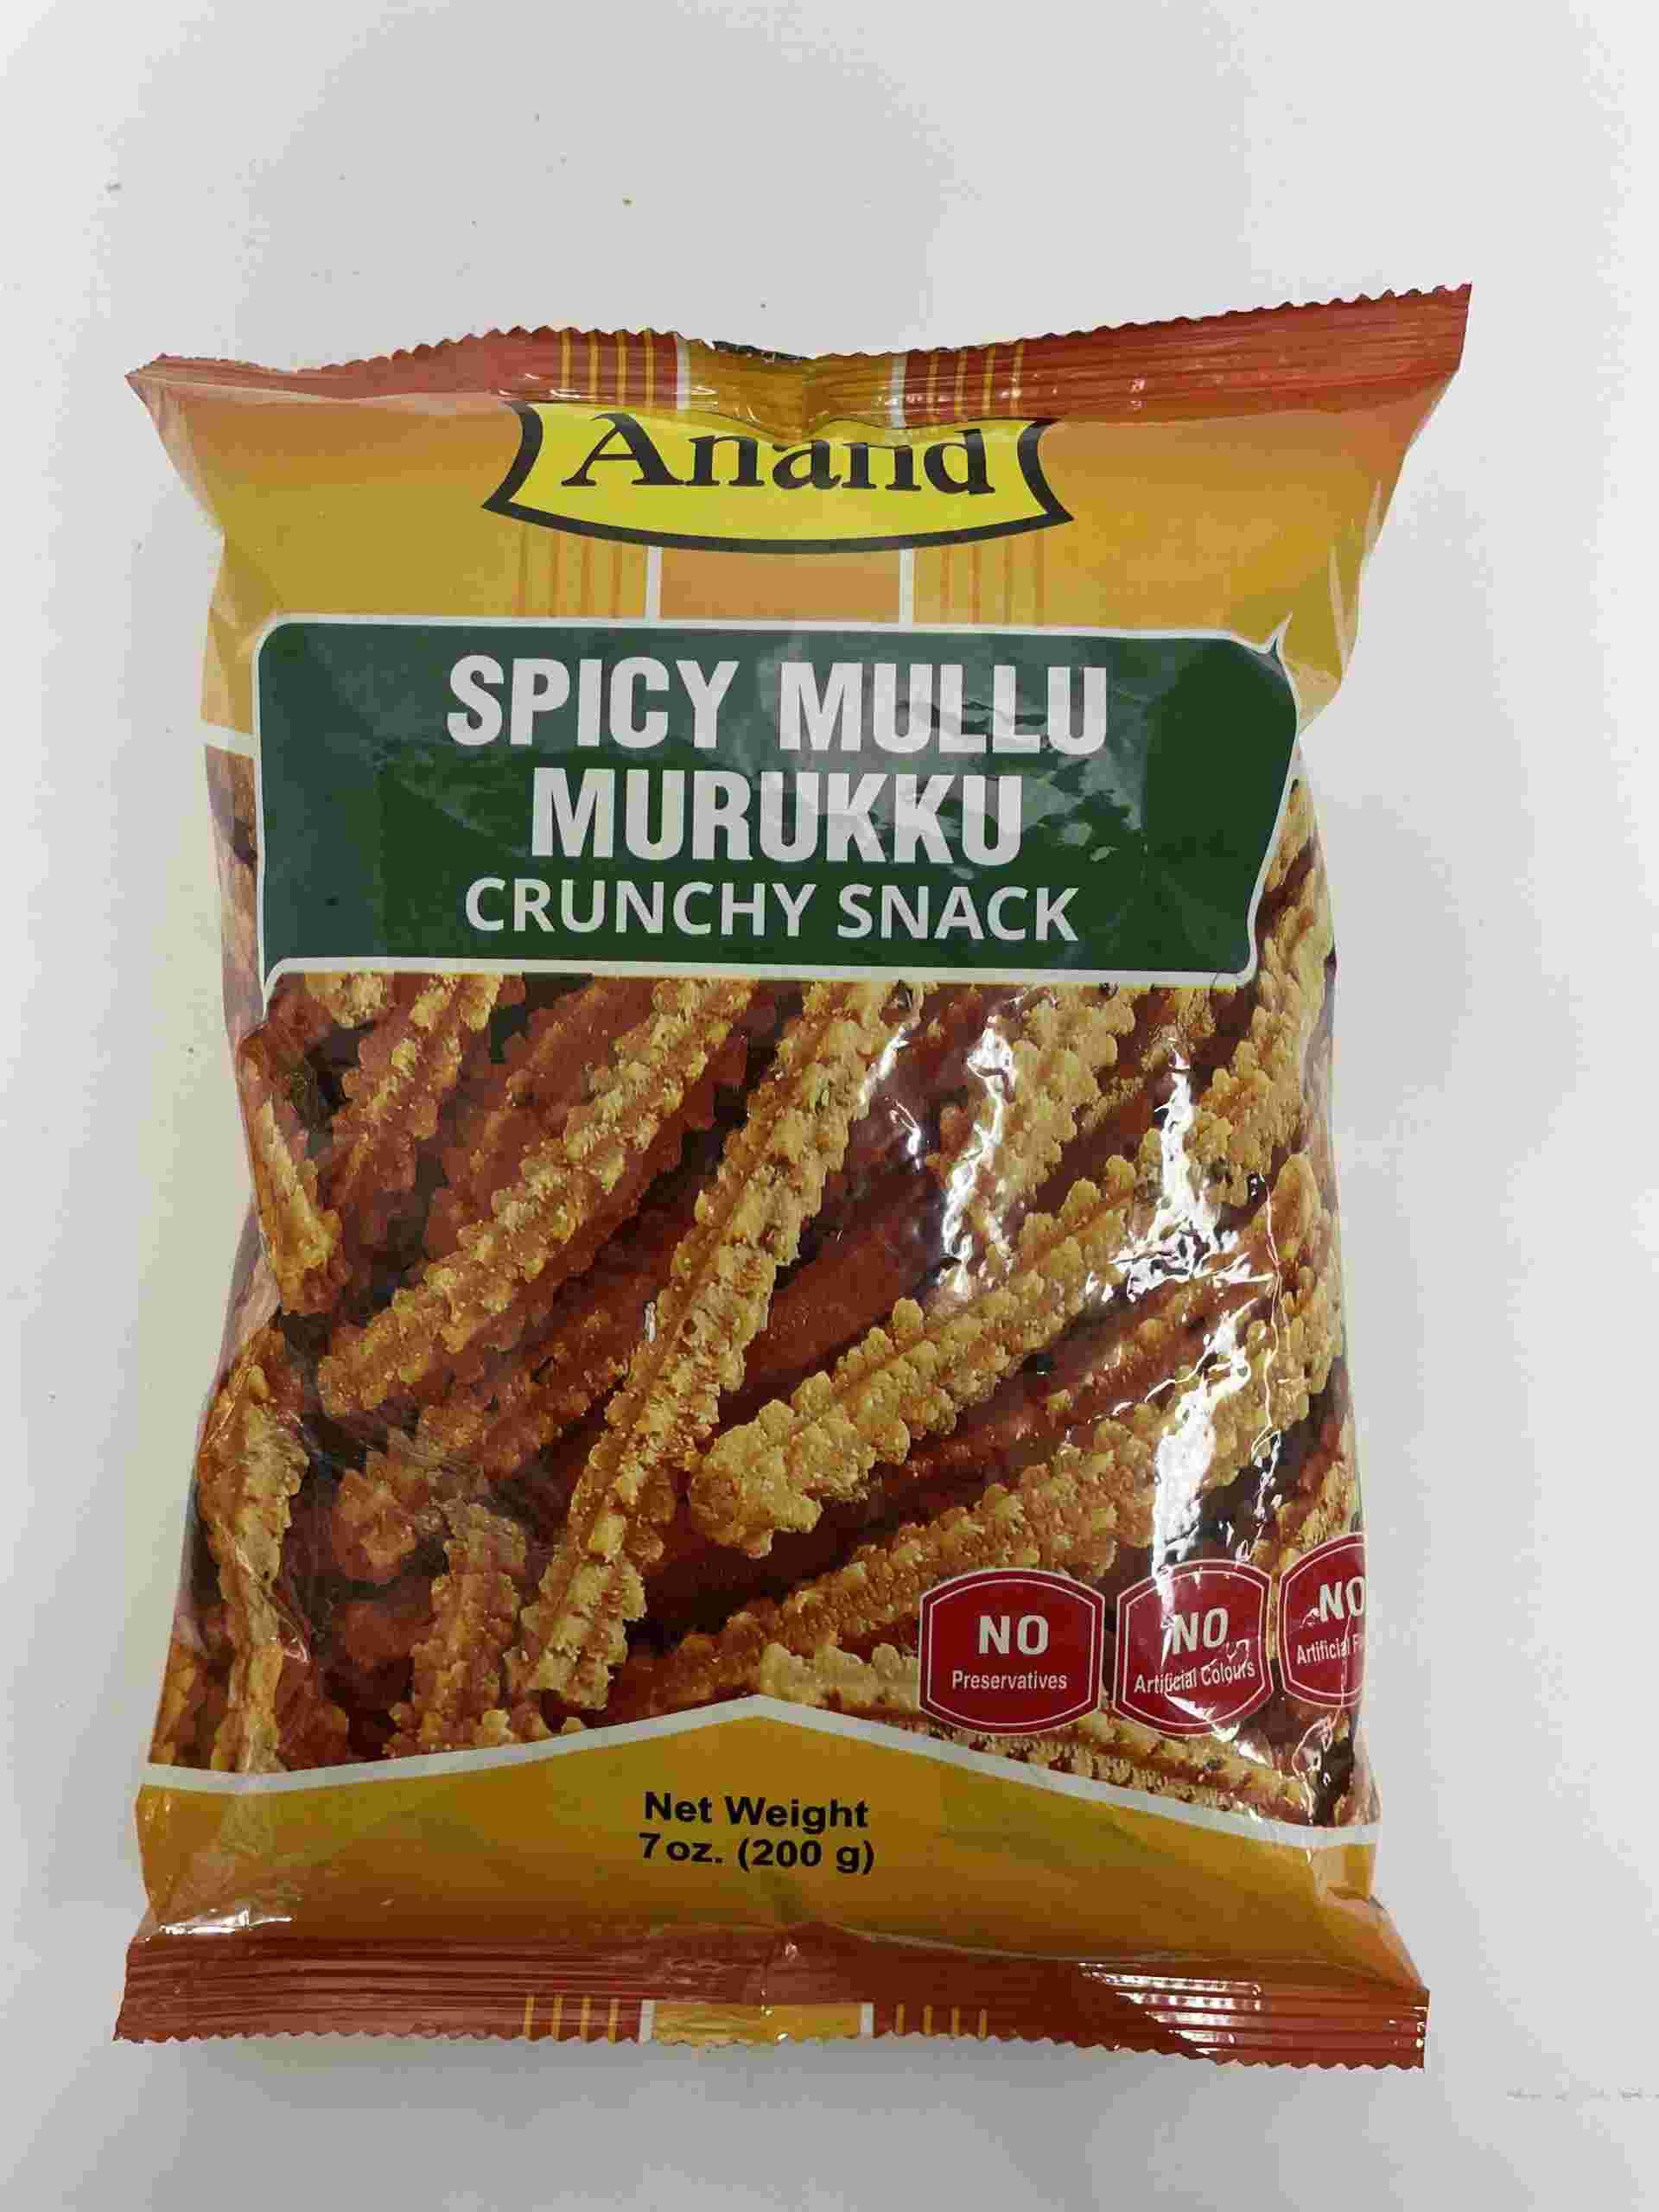 Anand Spicy Mullu Mrukku Crunchy Snack